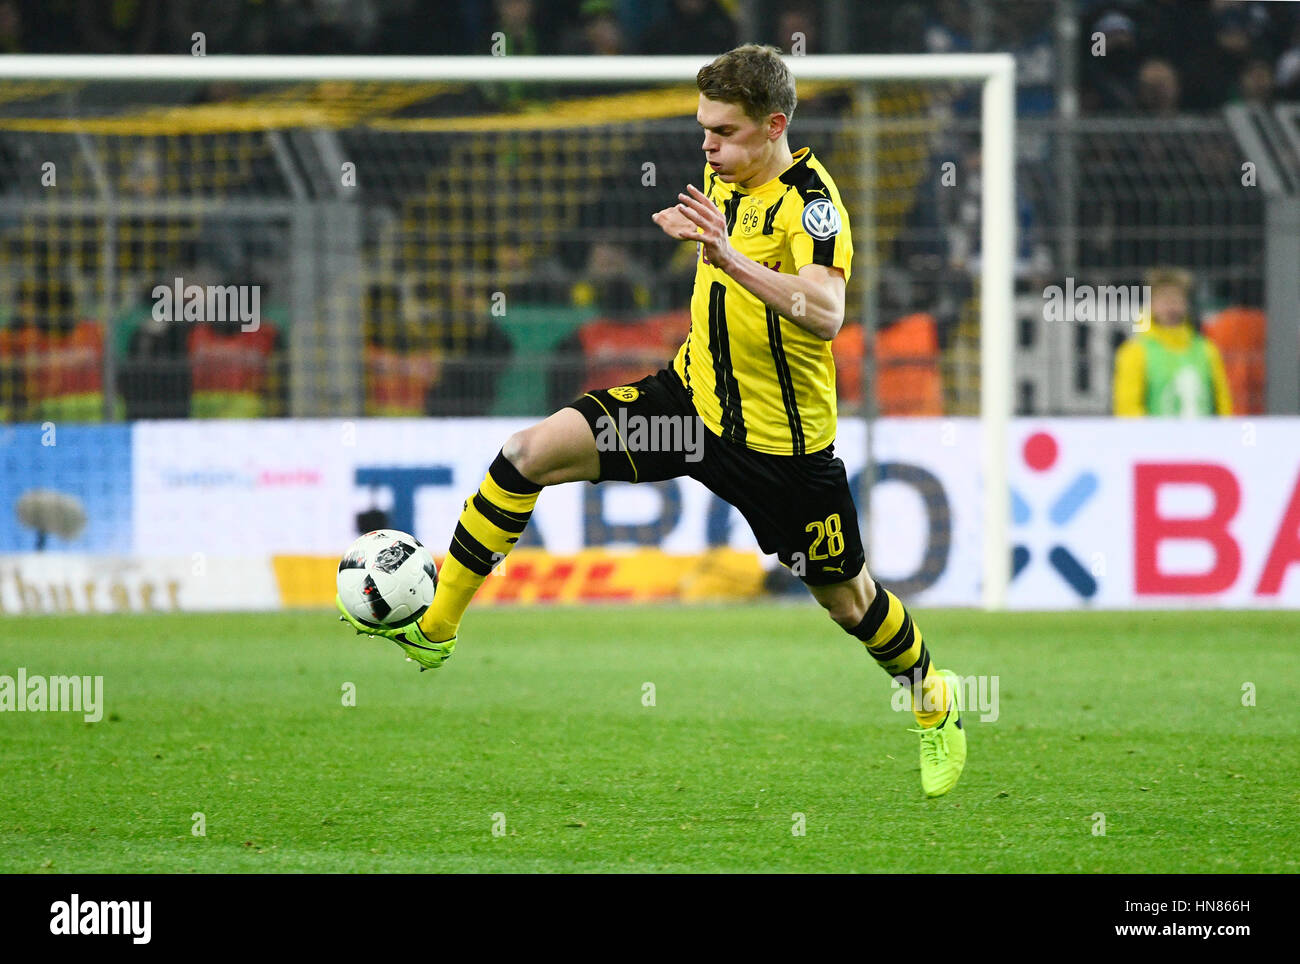 Signal-Iduna-Park Dortmund, Deutschland. 8. Februar 2017. DFB-Pokal-Runde DFB-Pokal 2016/17 der sechzehn, Borussia Stockfoto